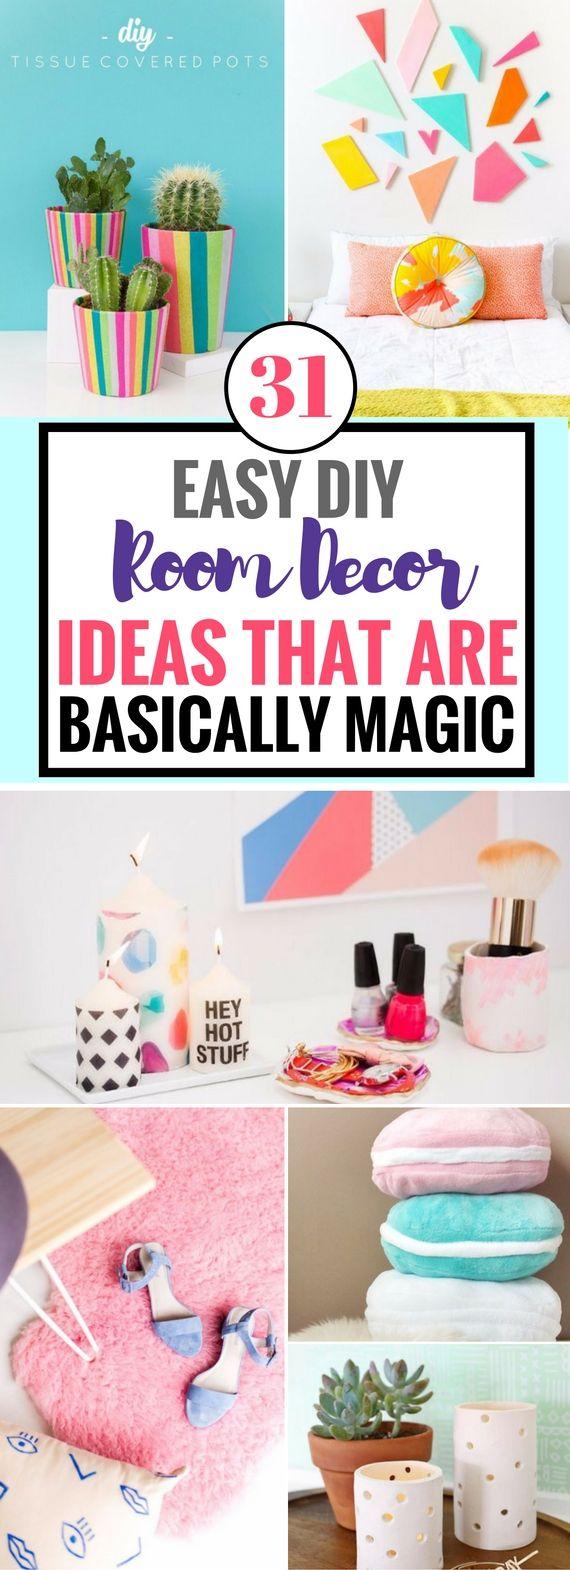 Best 25  Cheap room decor ideas on Pinterest   Diy room decor for college   Girl room decor and Cheap bedroom ideas. Best 25  Cheap room decor ideas on Pinterest   Diy room decor for